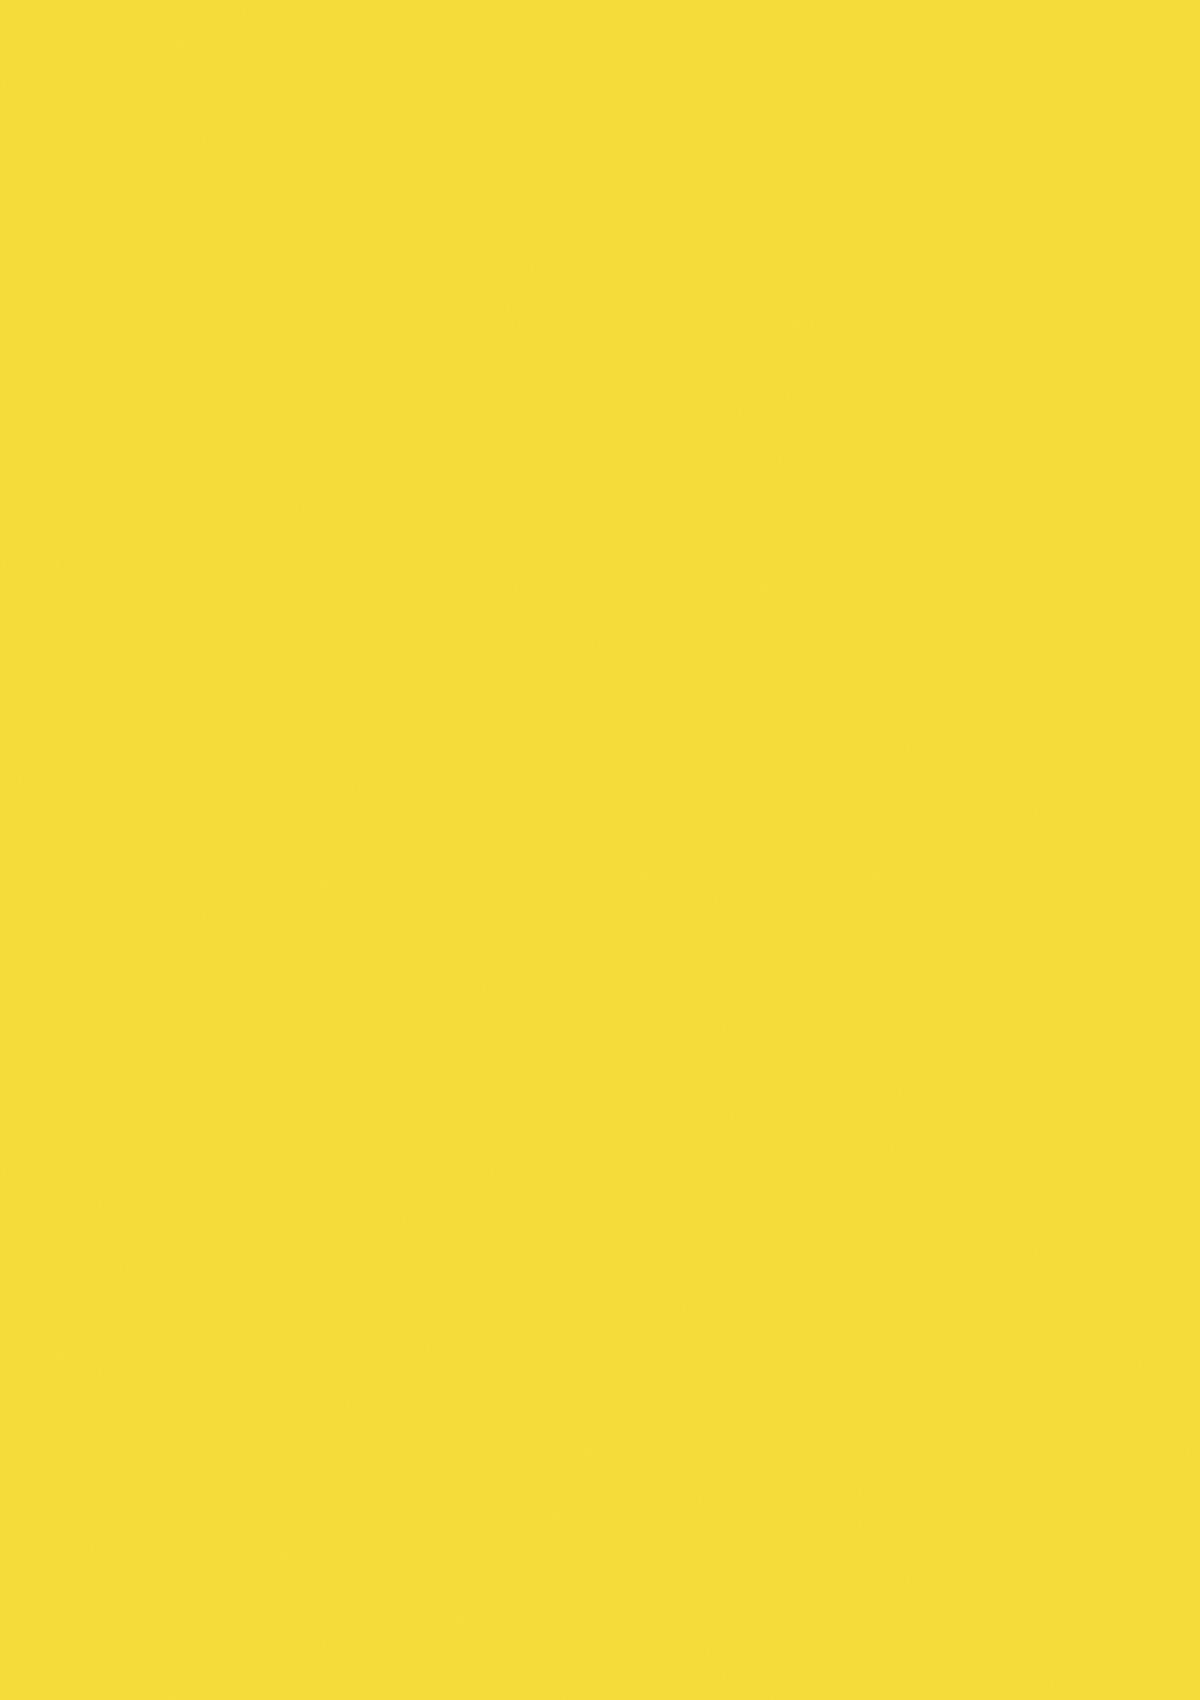 Zitronengelb - Perl